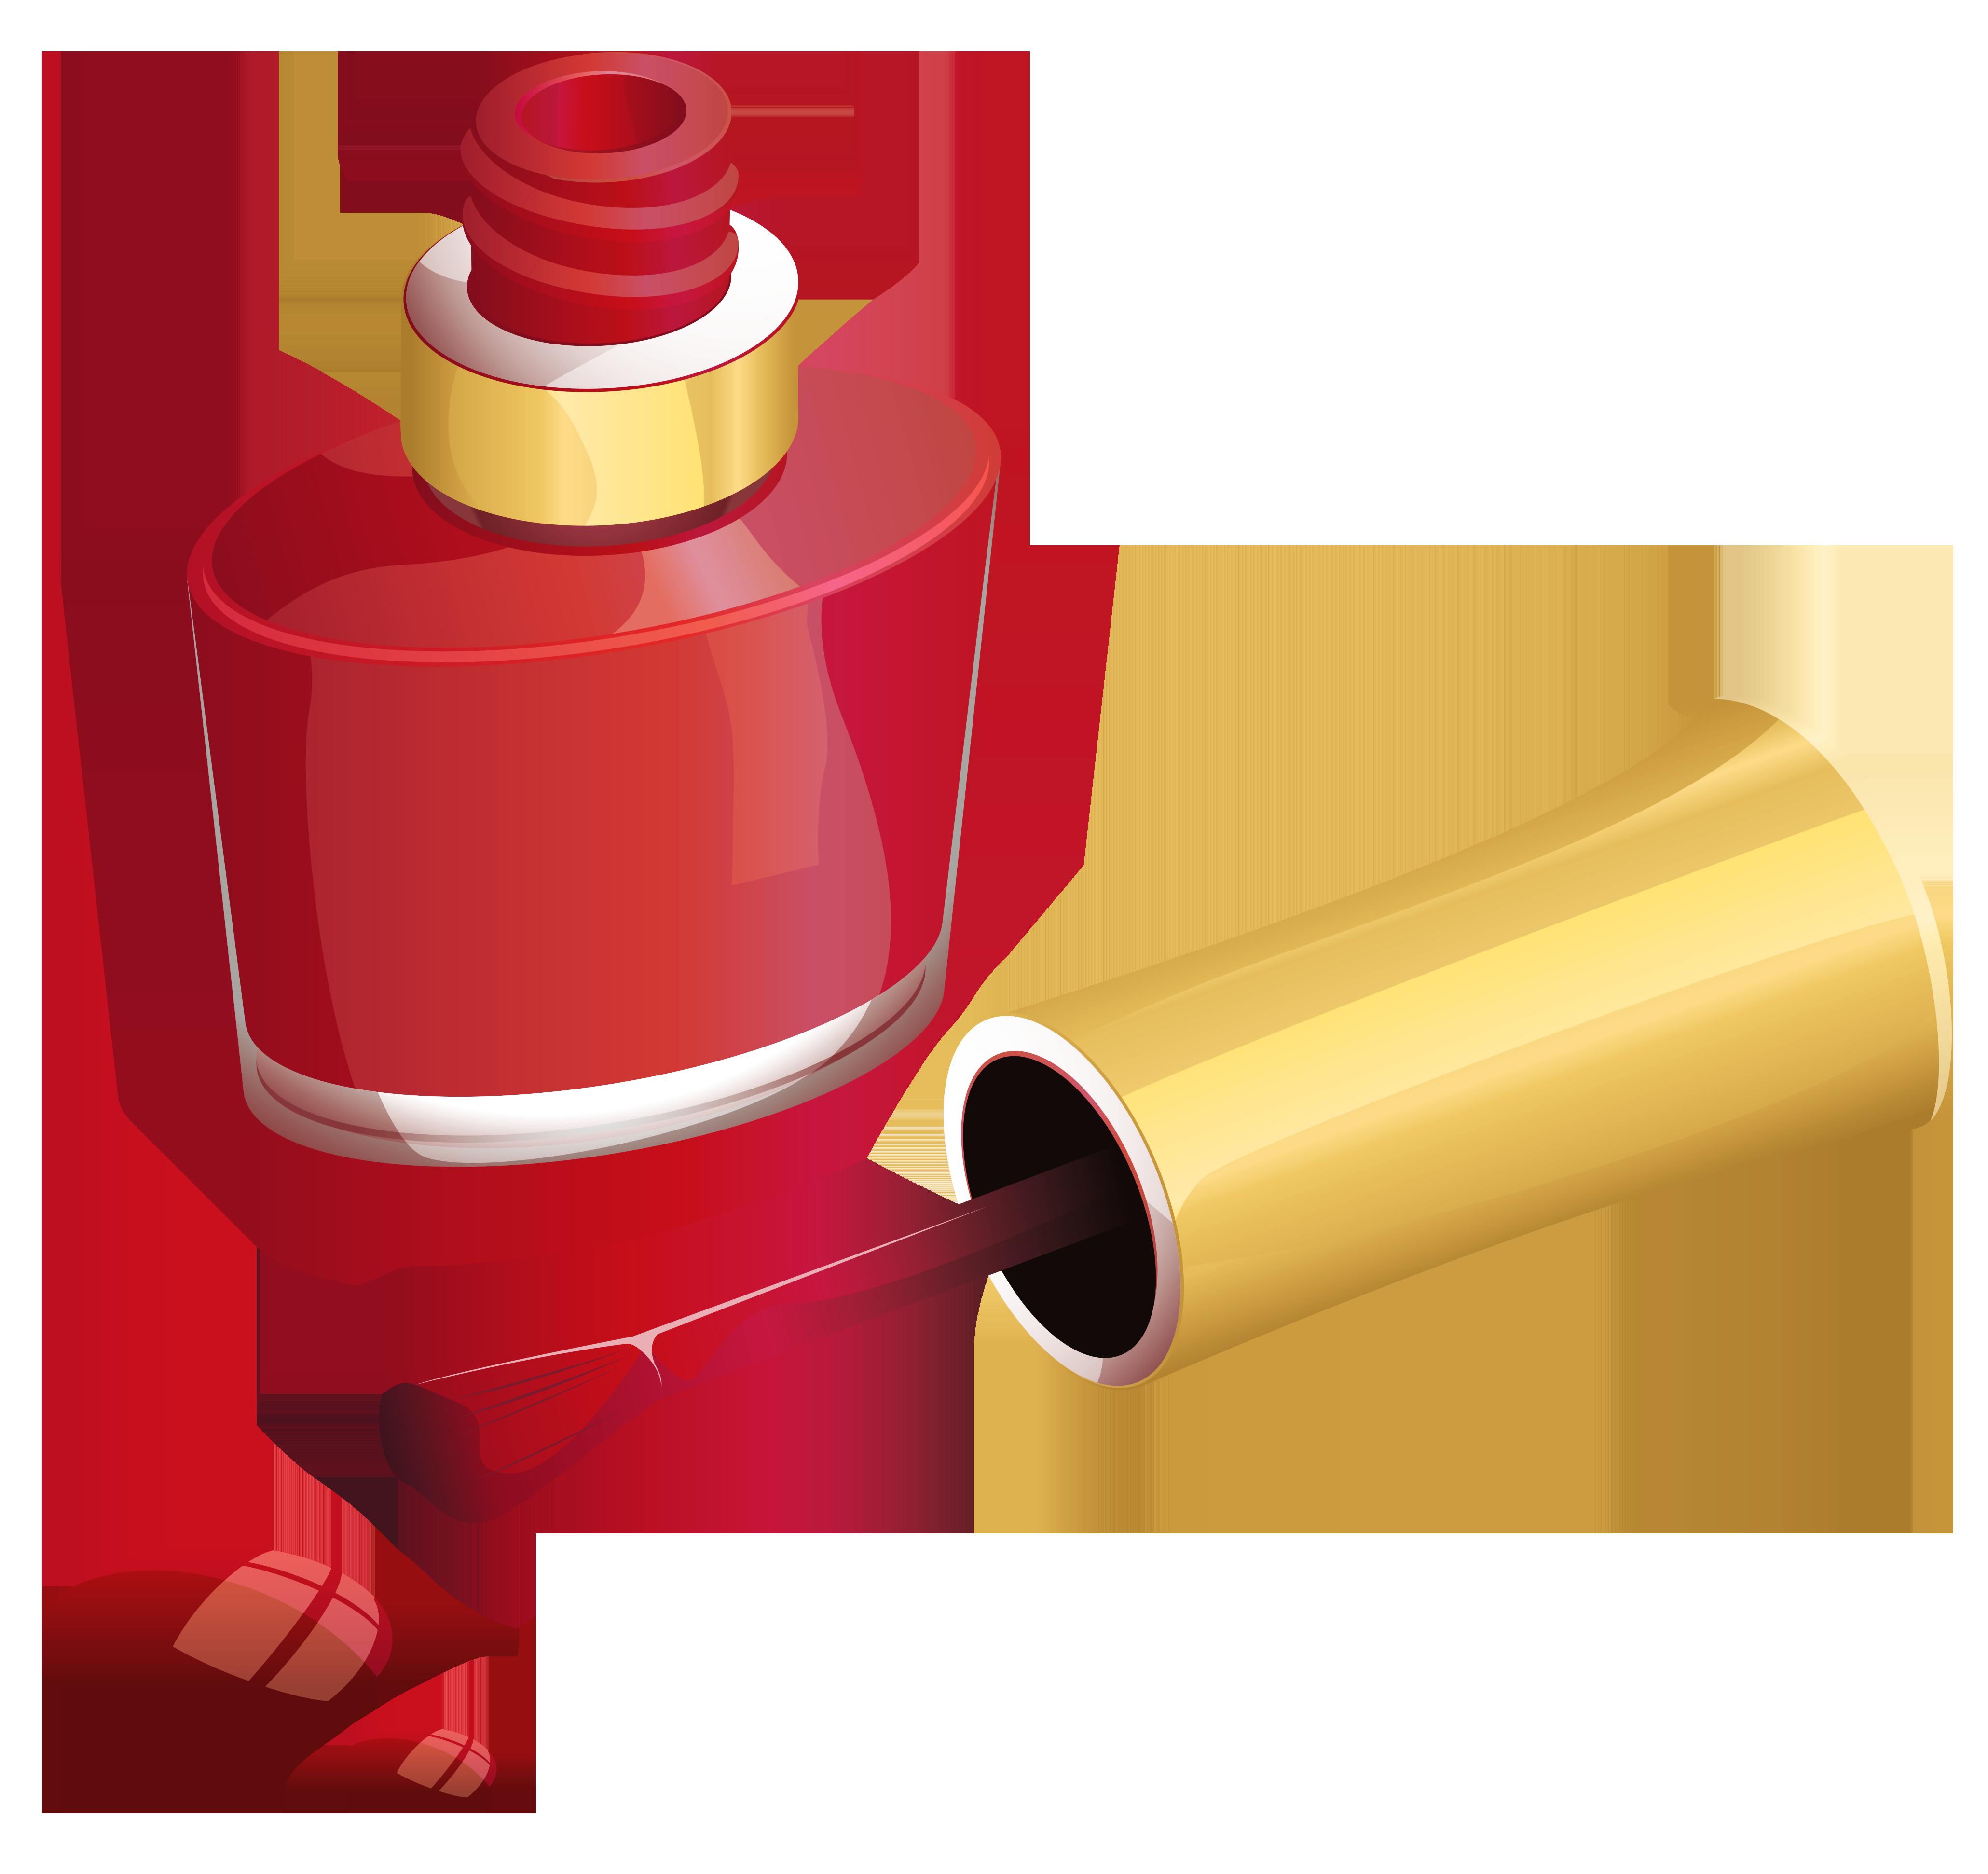 Nails clipart clean habit. Red nail polish png